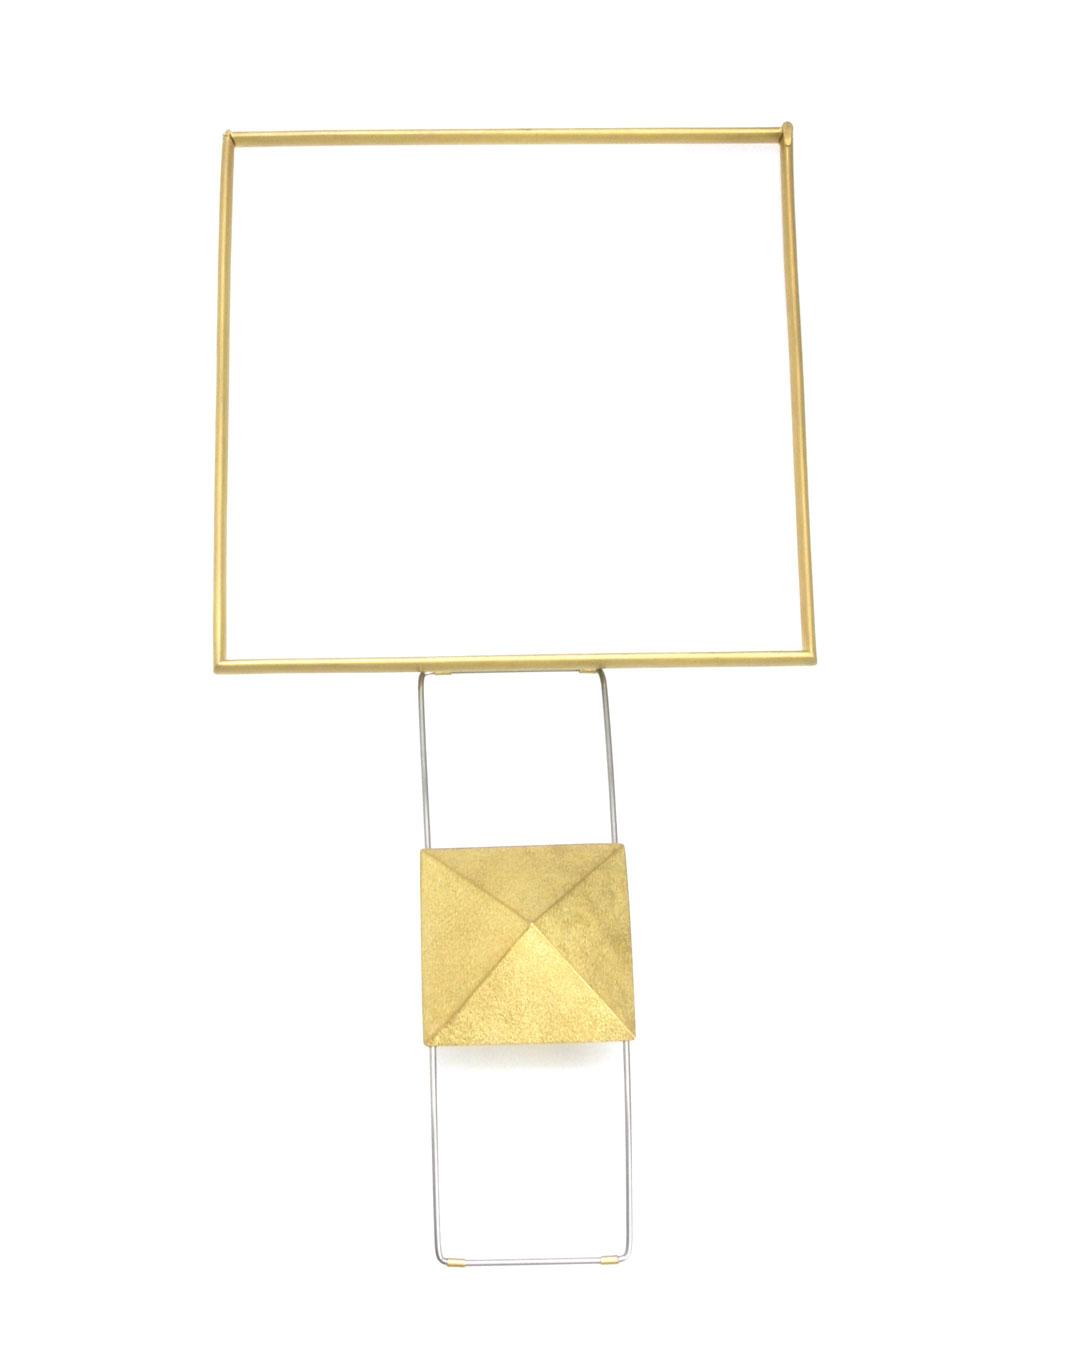 Okinari Kurokawa, untitled, 2007, necklace; 20ct gold, stainless steel, 139 x 139 x 38 mm, €9700